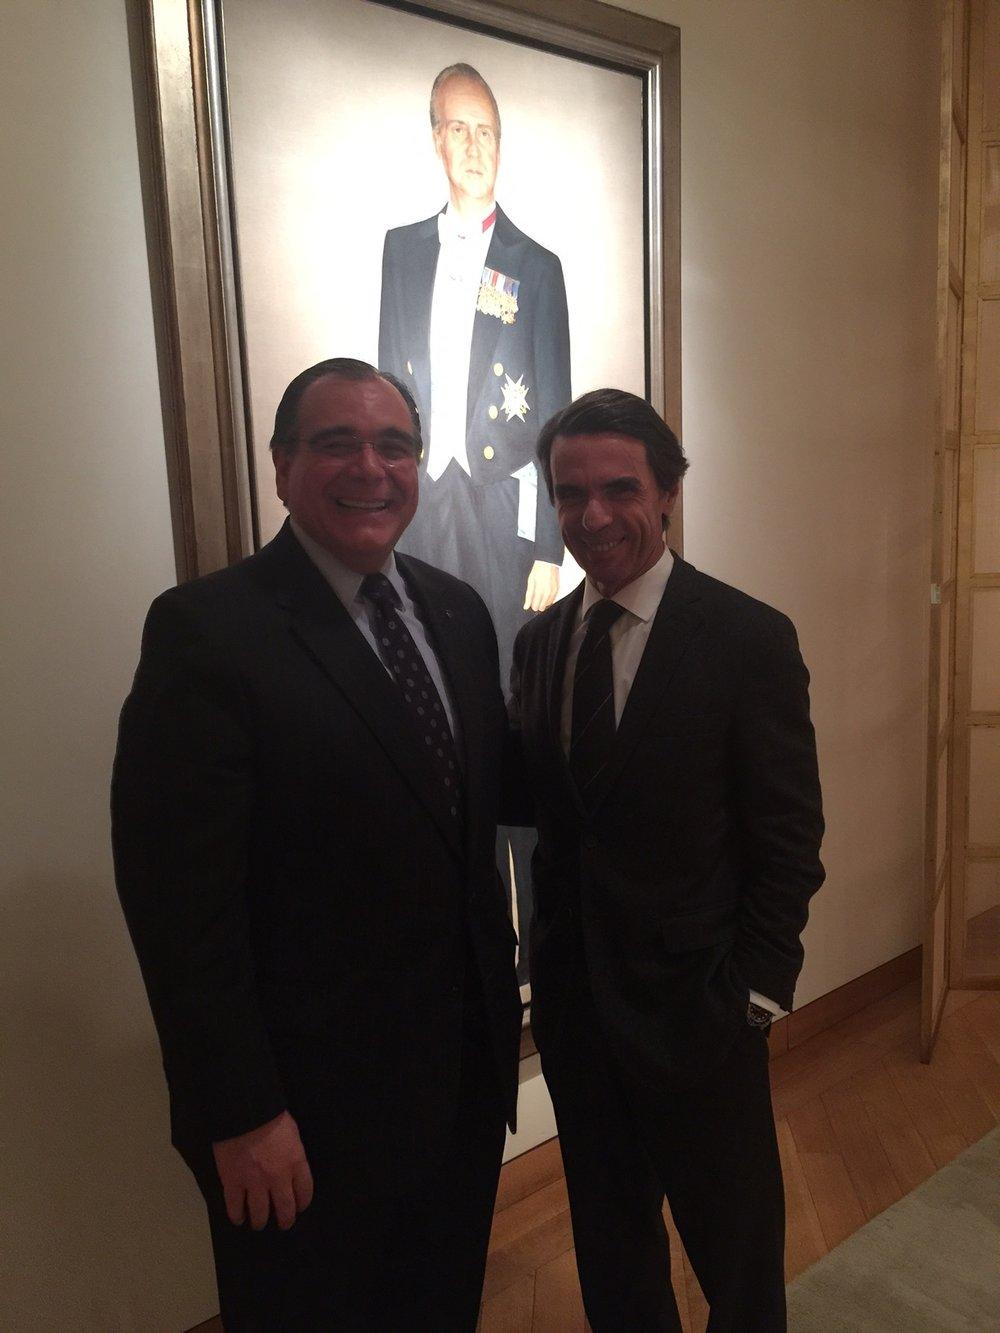 Juan José Daboub with Former President of Spain, José María Aznar